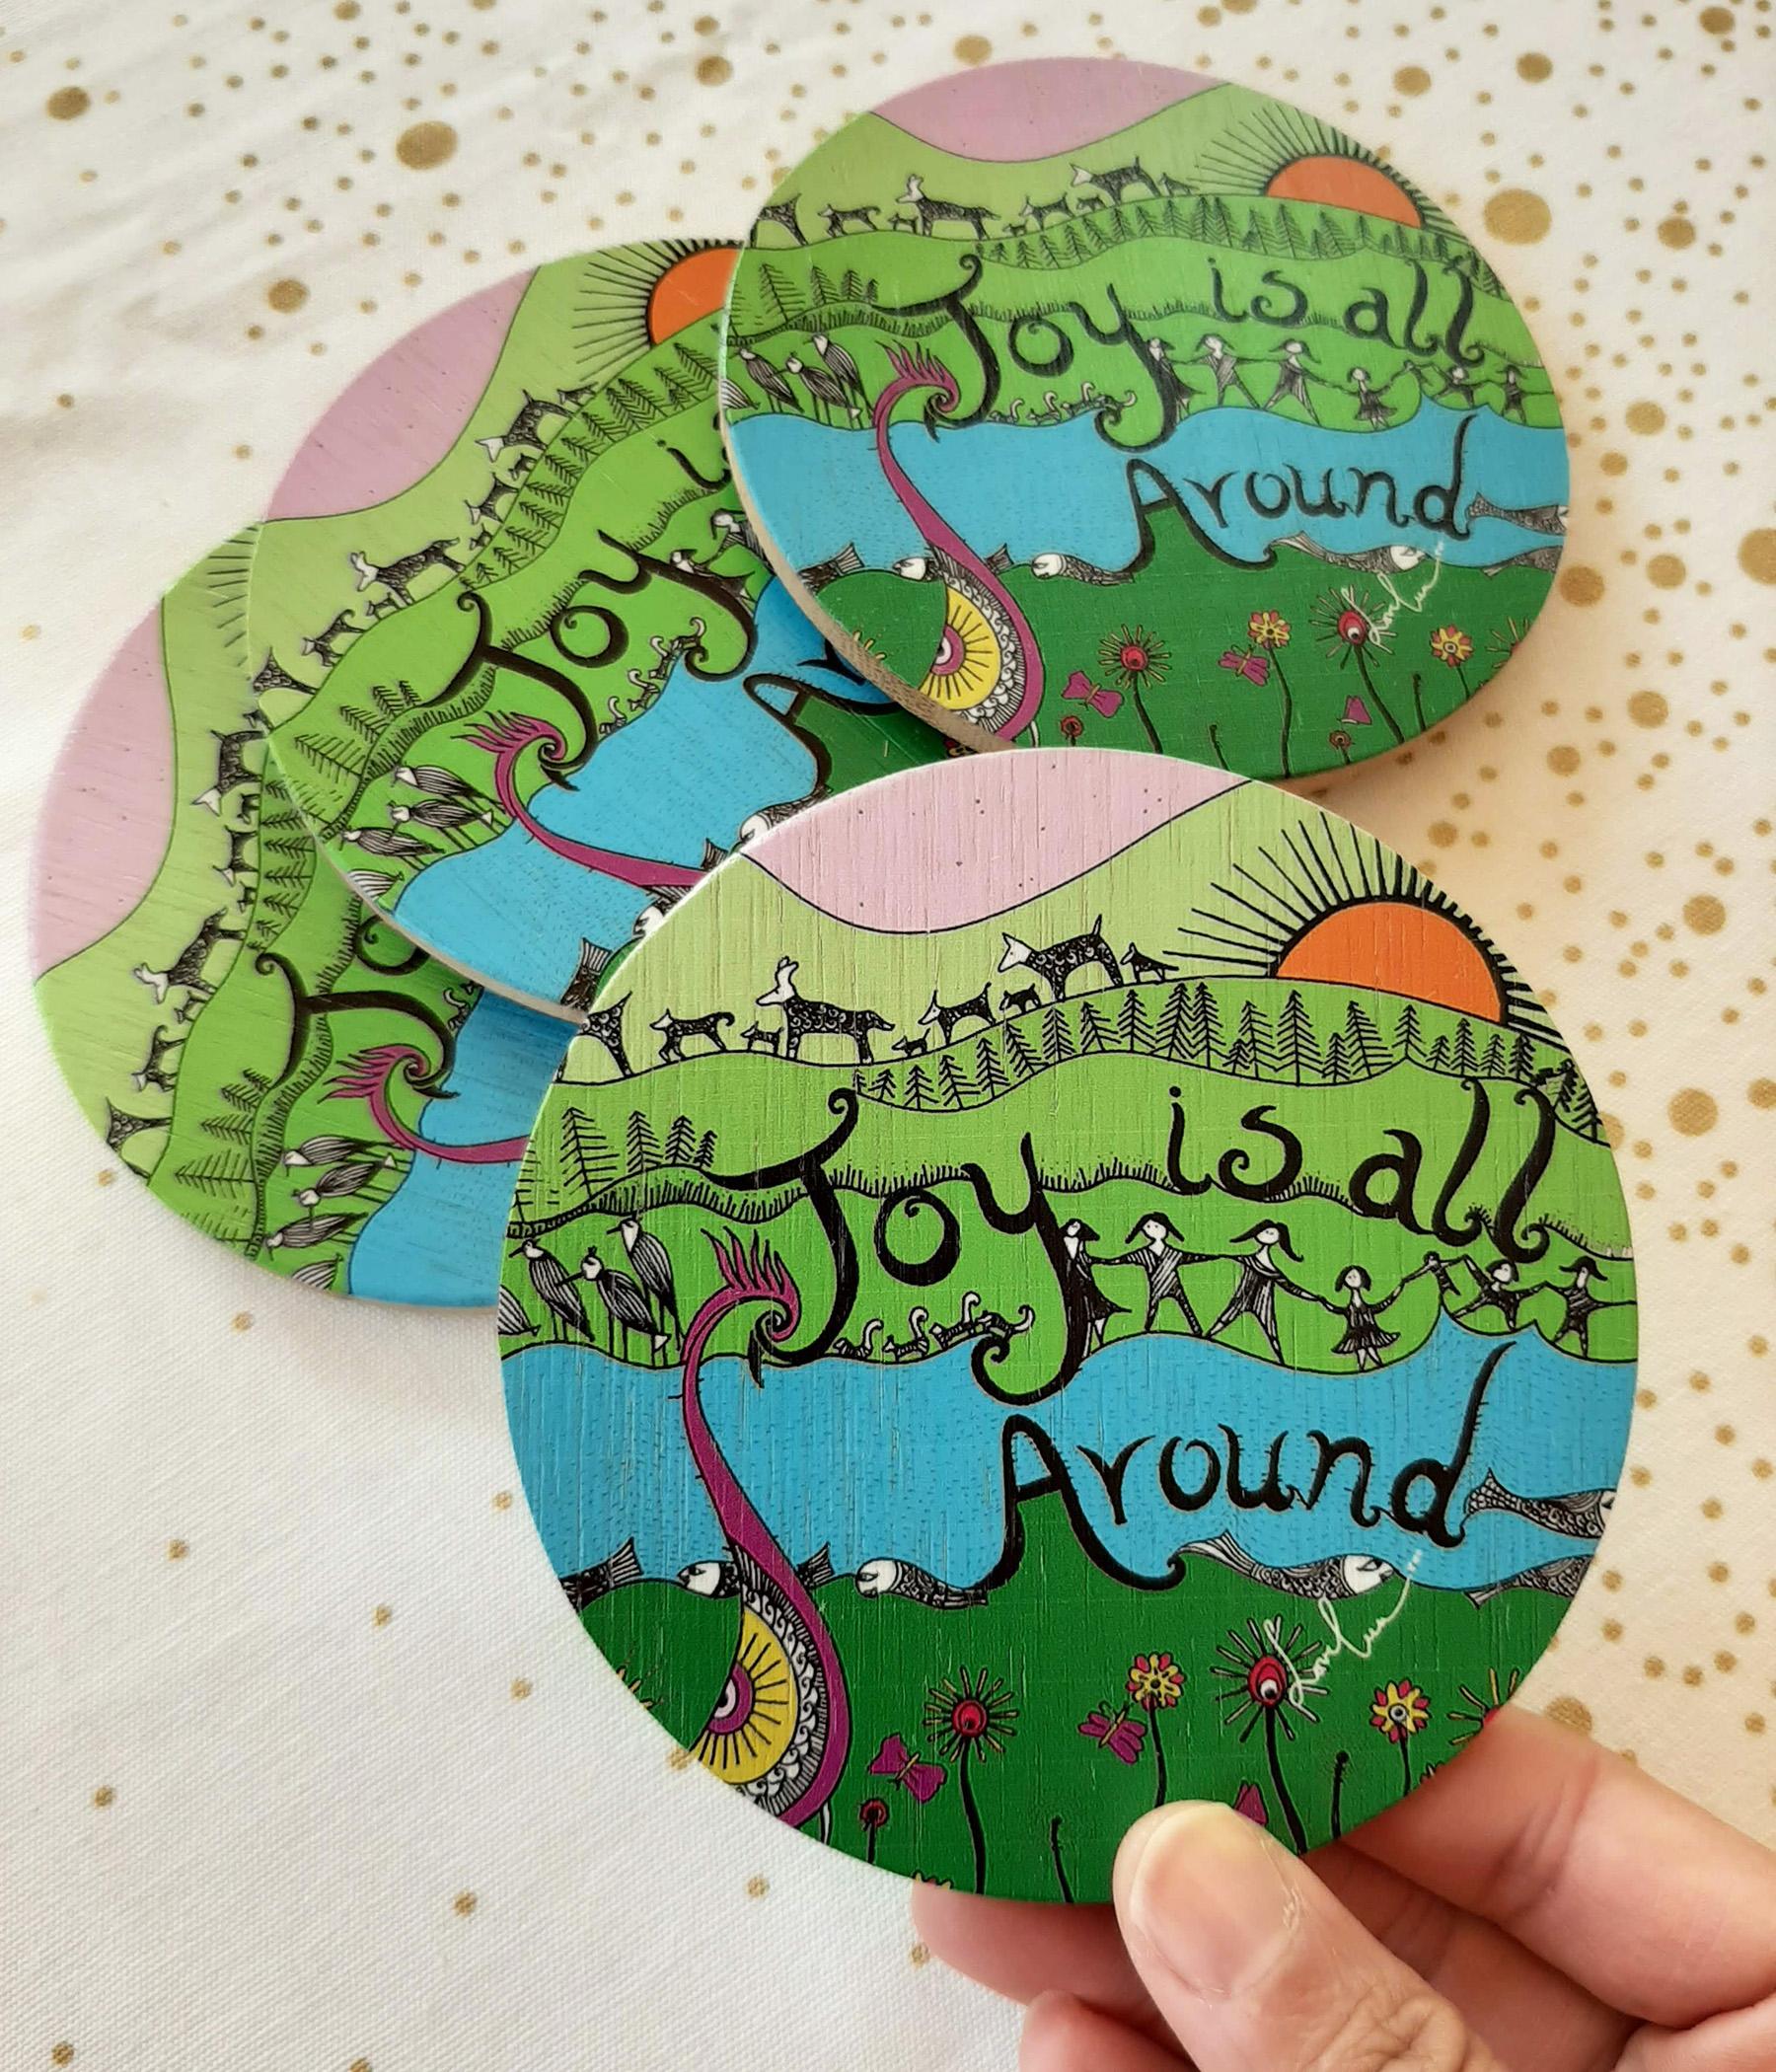 JOY-is-all-around-coasters